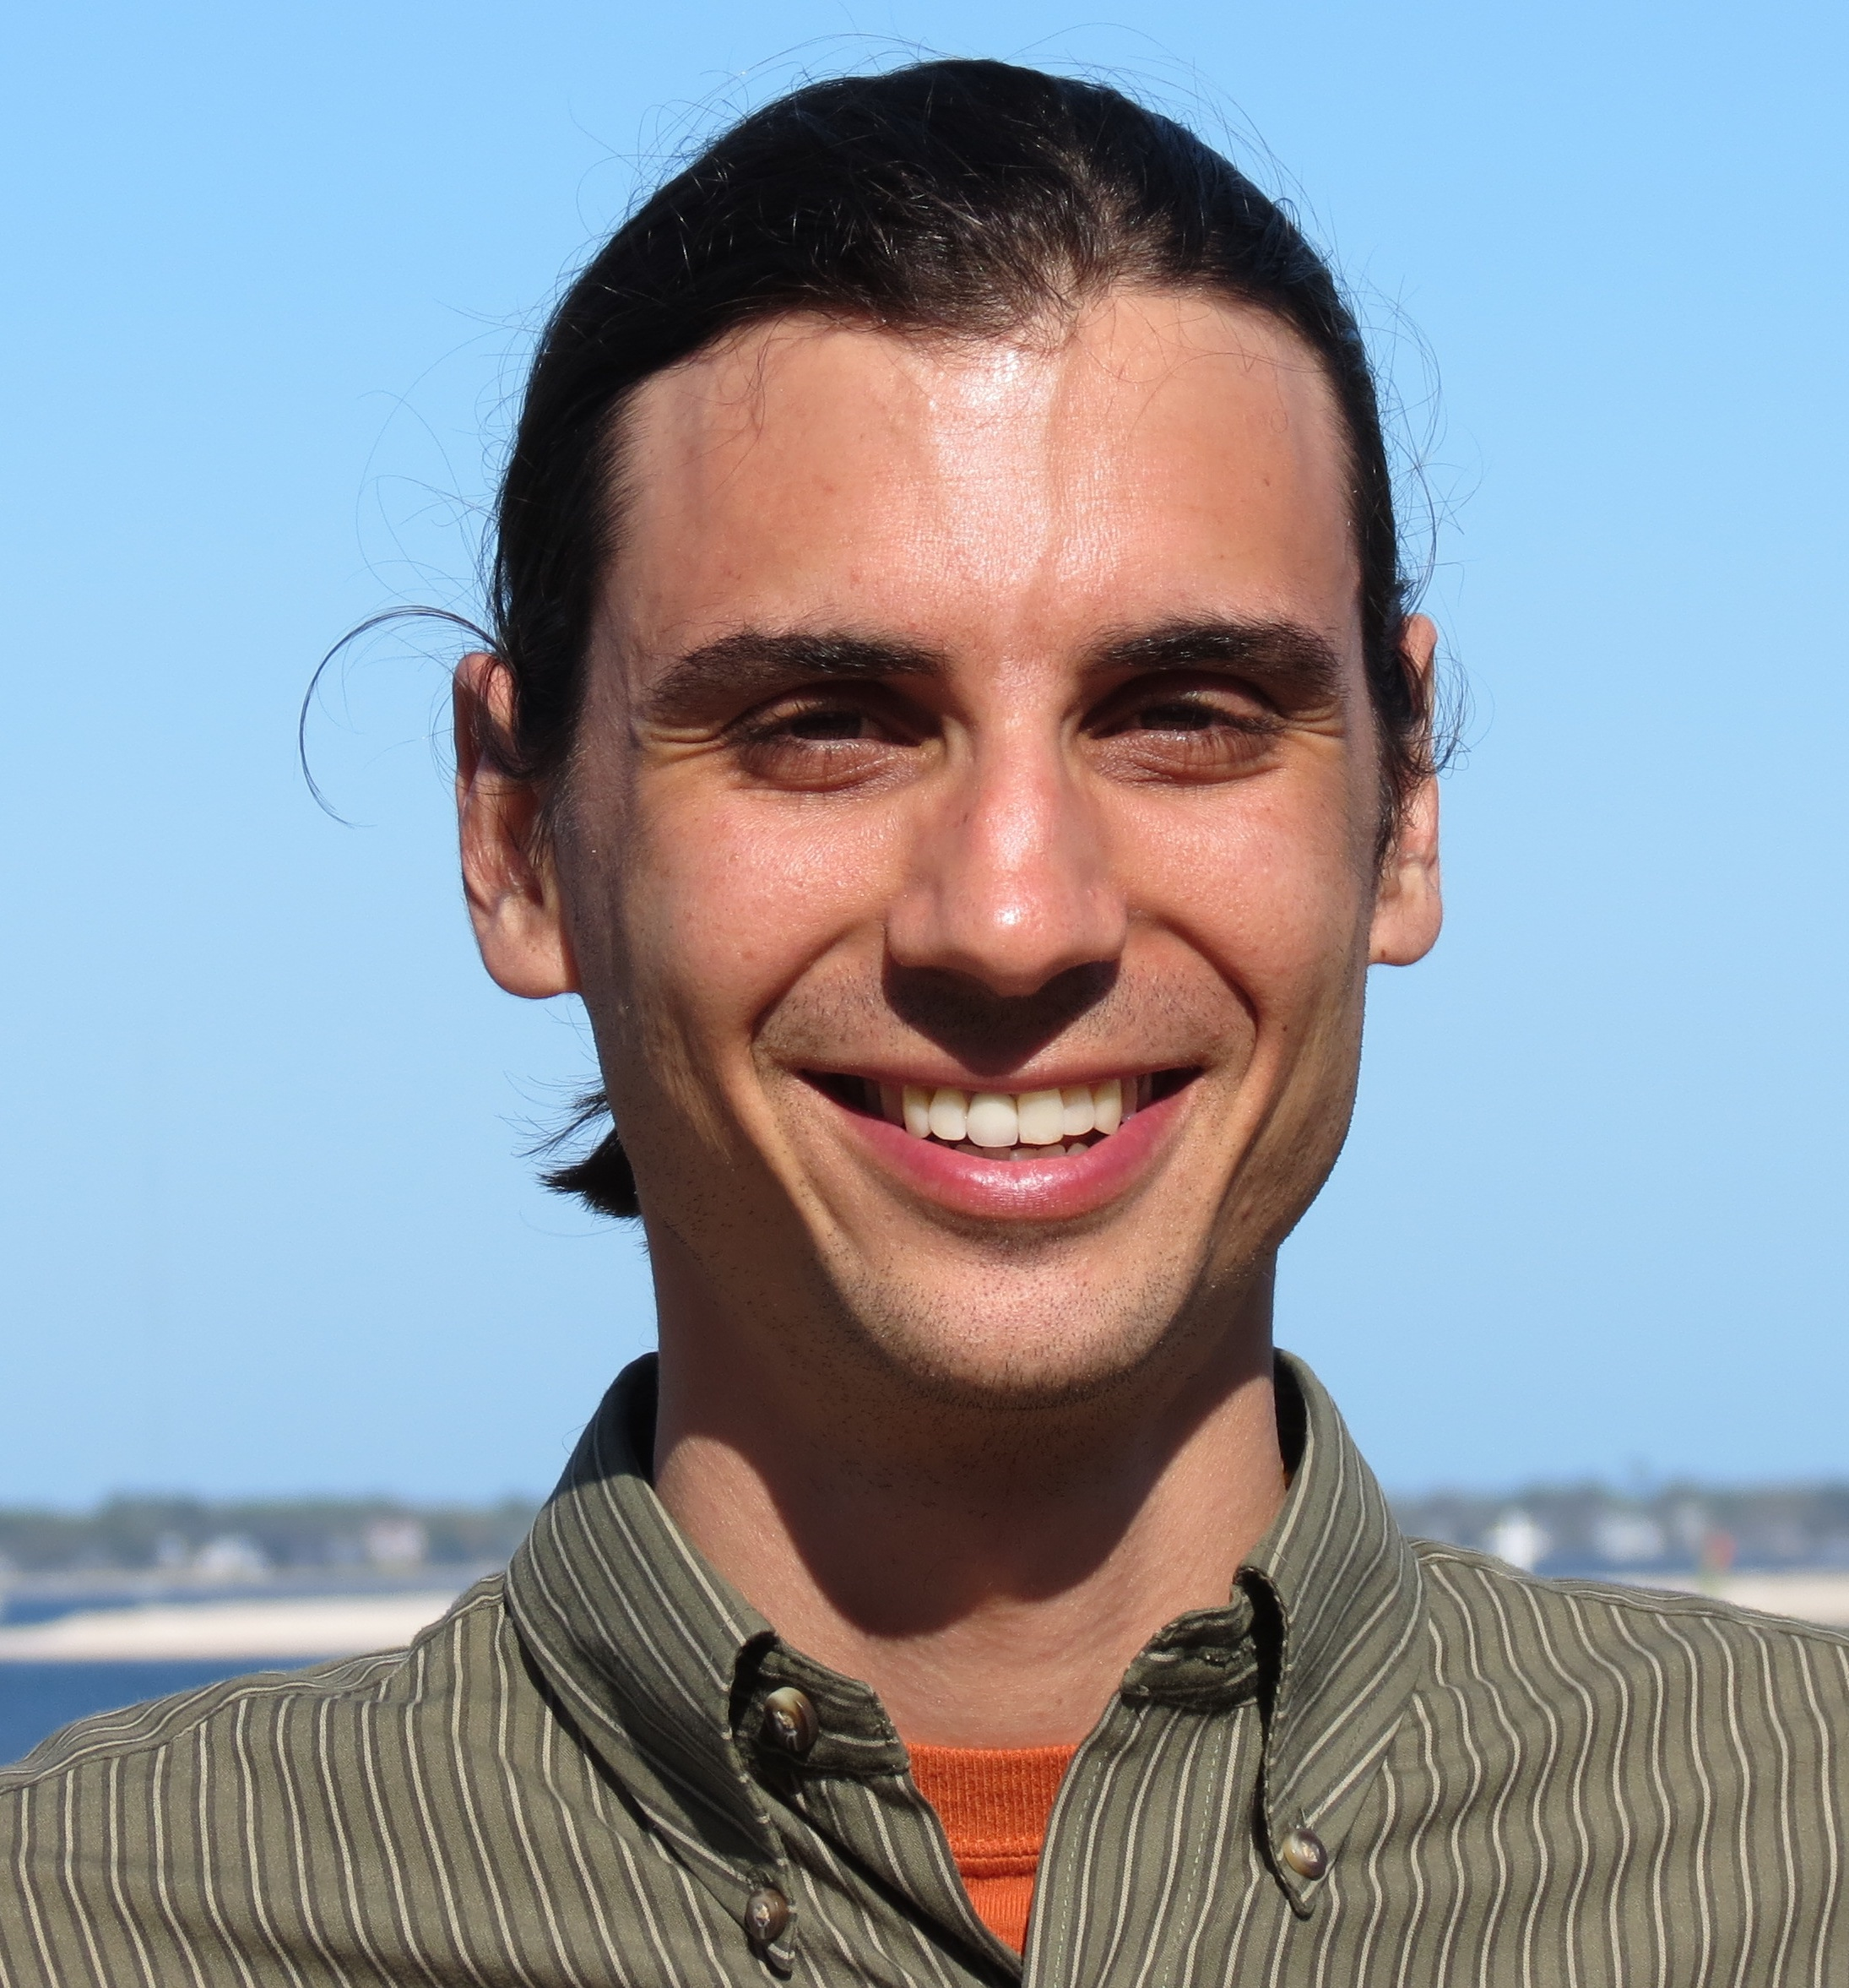 Joseph Tonzola L.Ac., Dipl. O.M., Acupuncturist